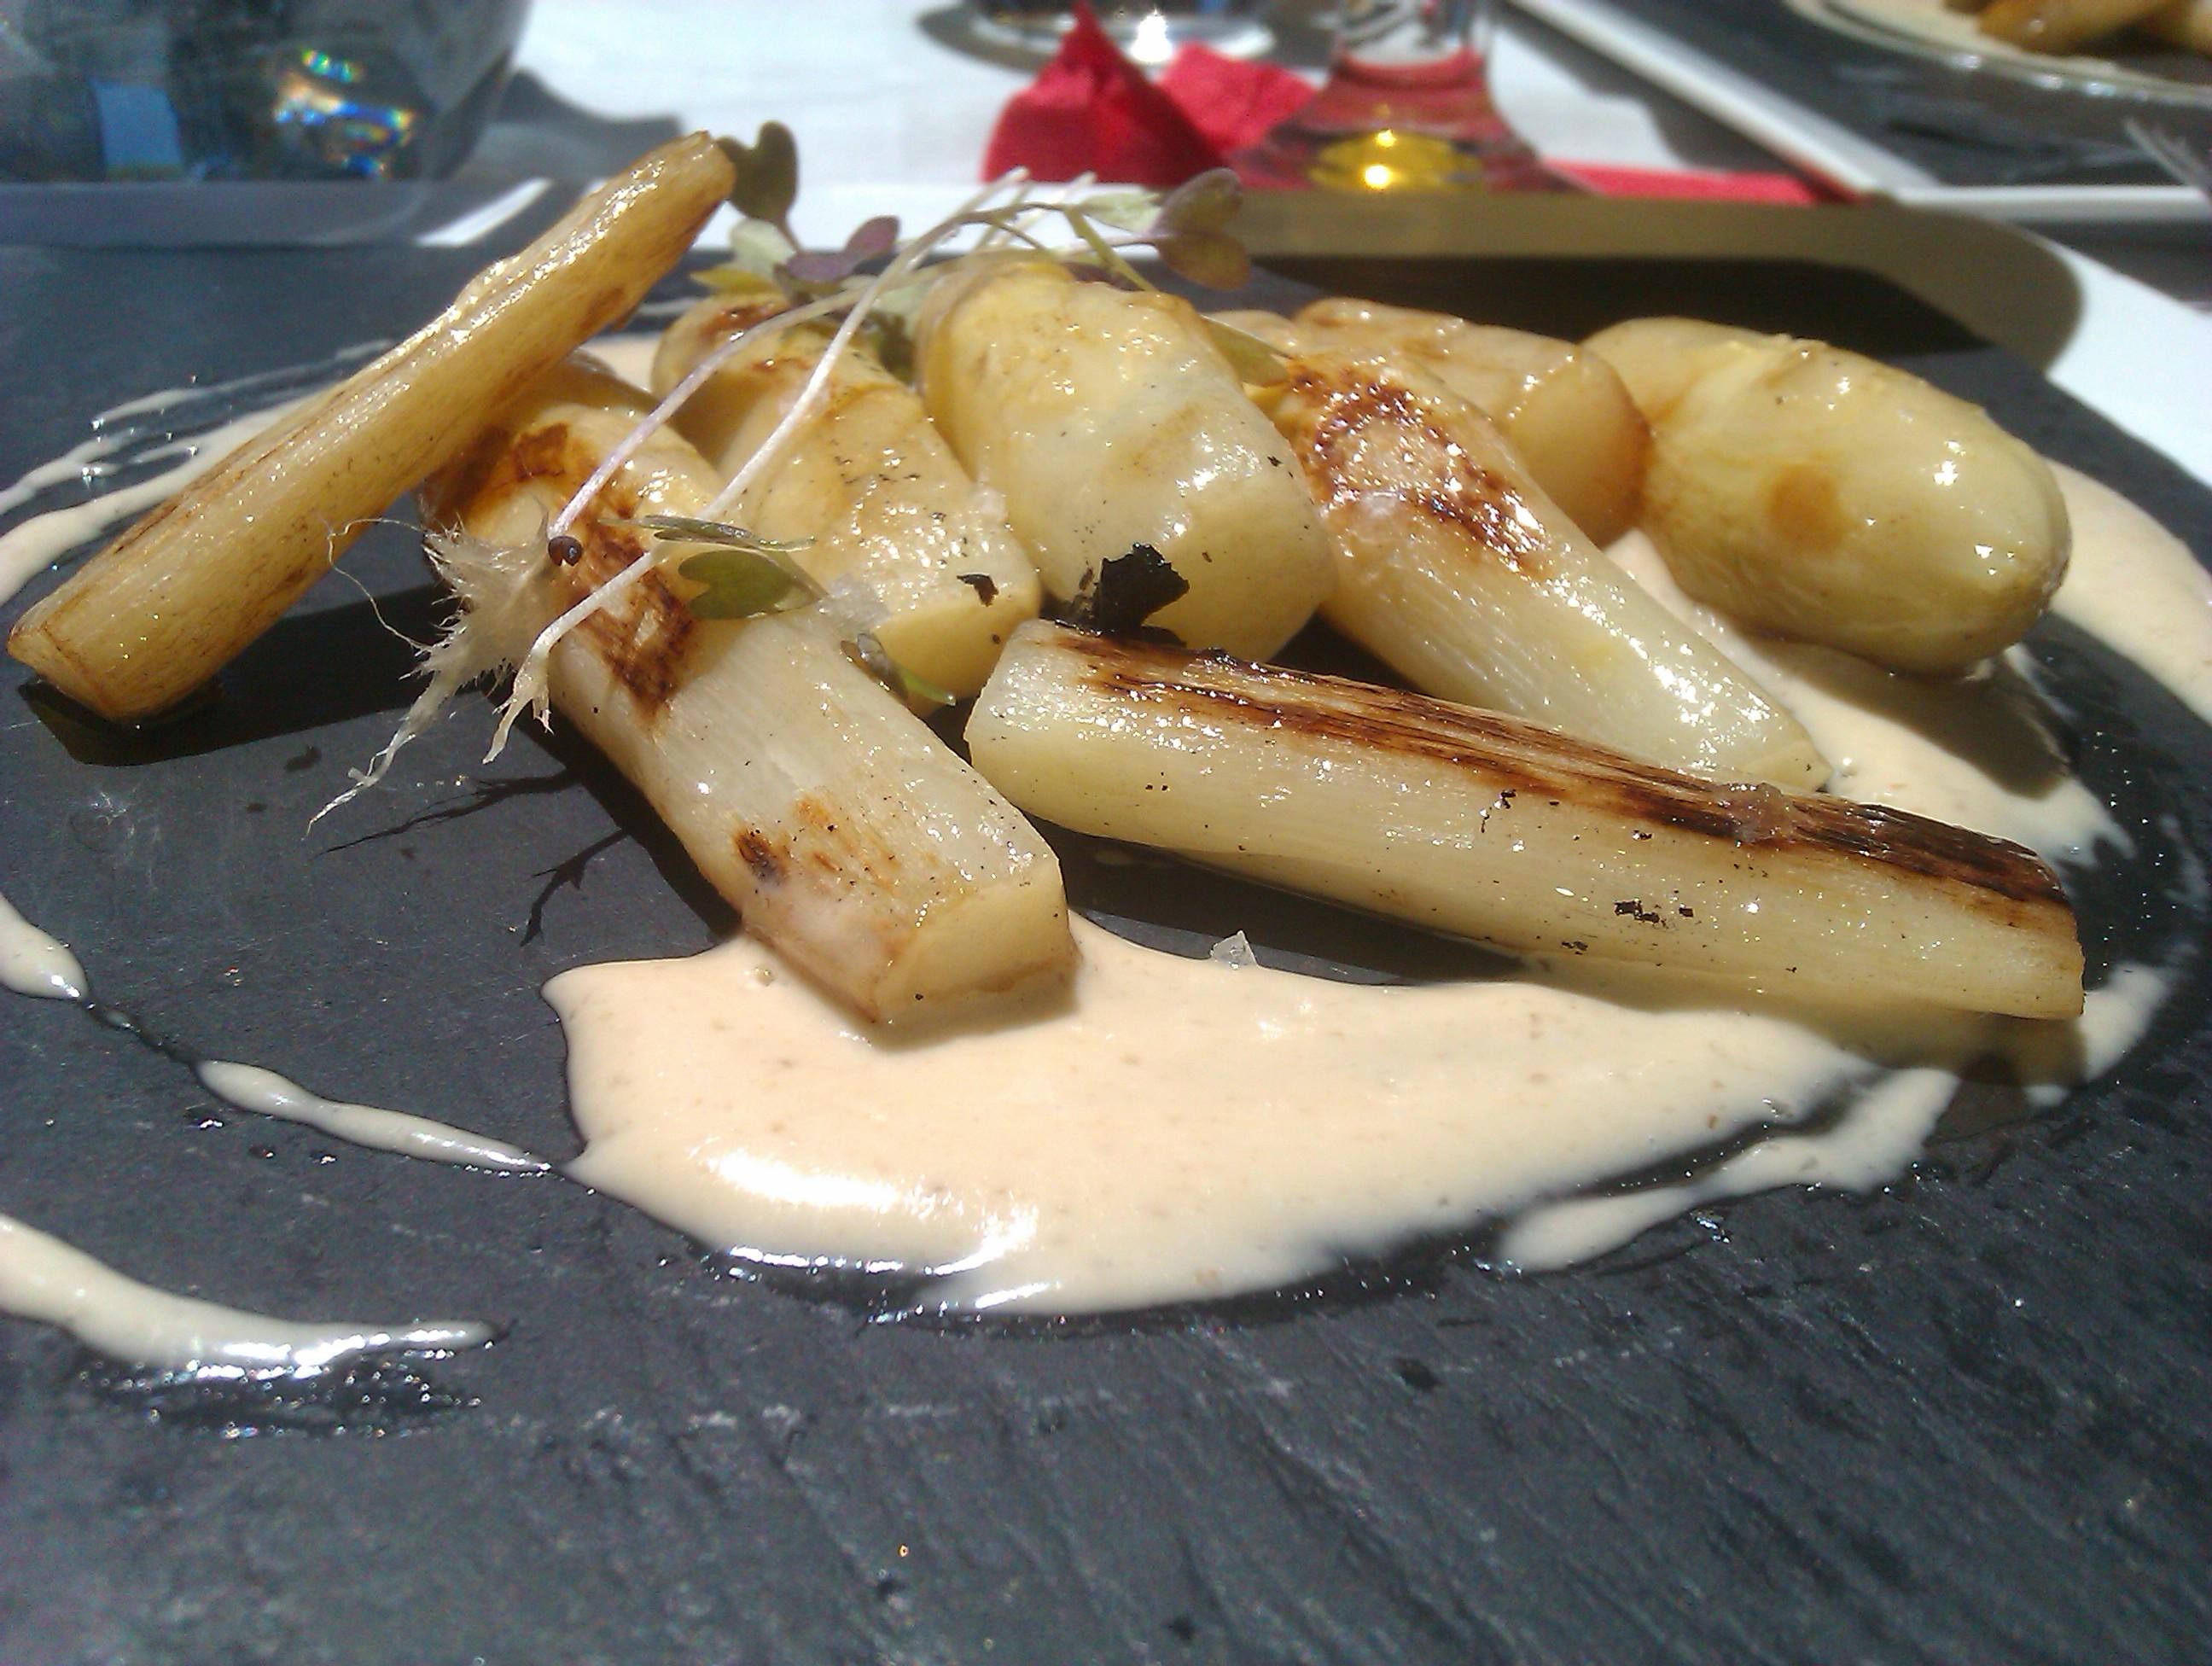 Restaurante El 24 de la Paloma en Burgos grilled Asparagus with Hazelnut Butter and Boletus Mayonnaise